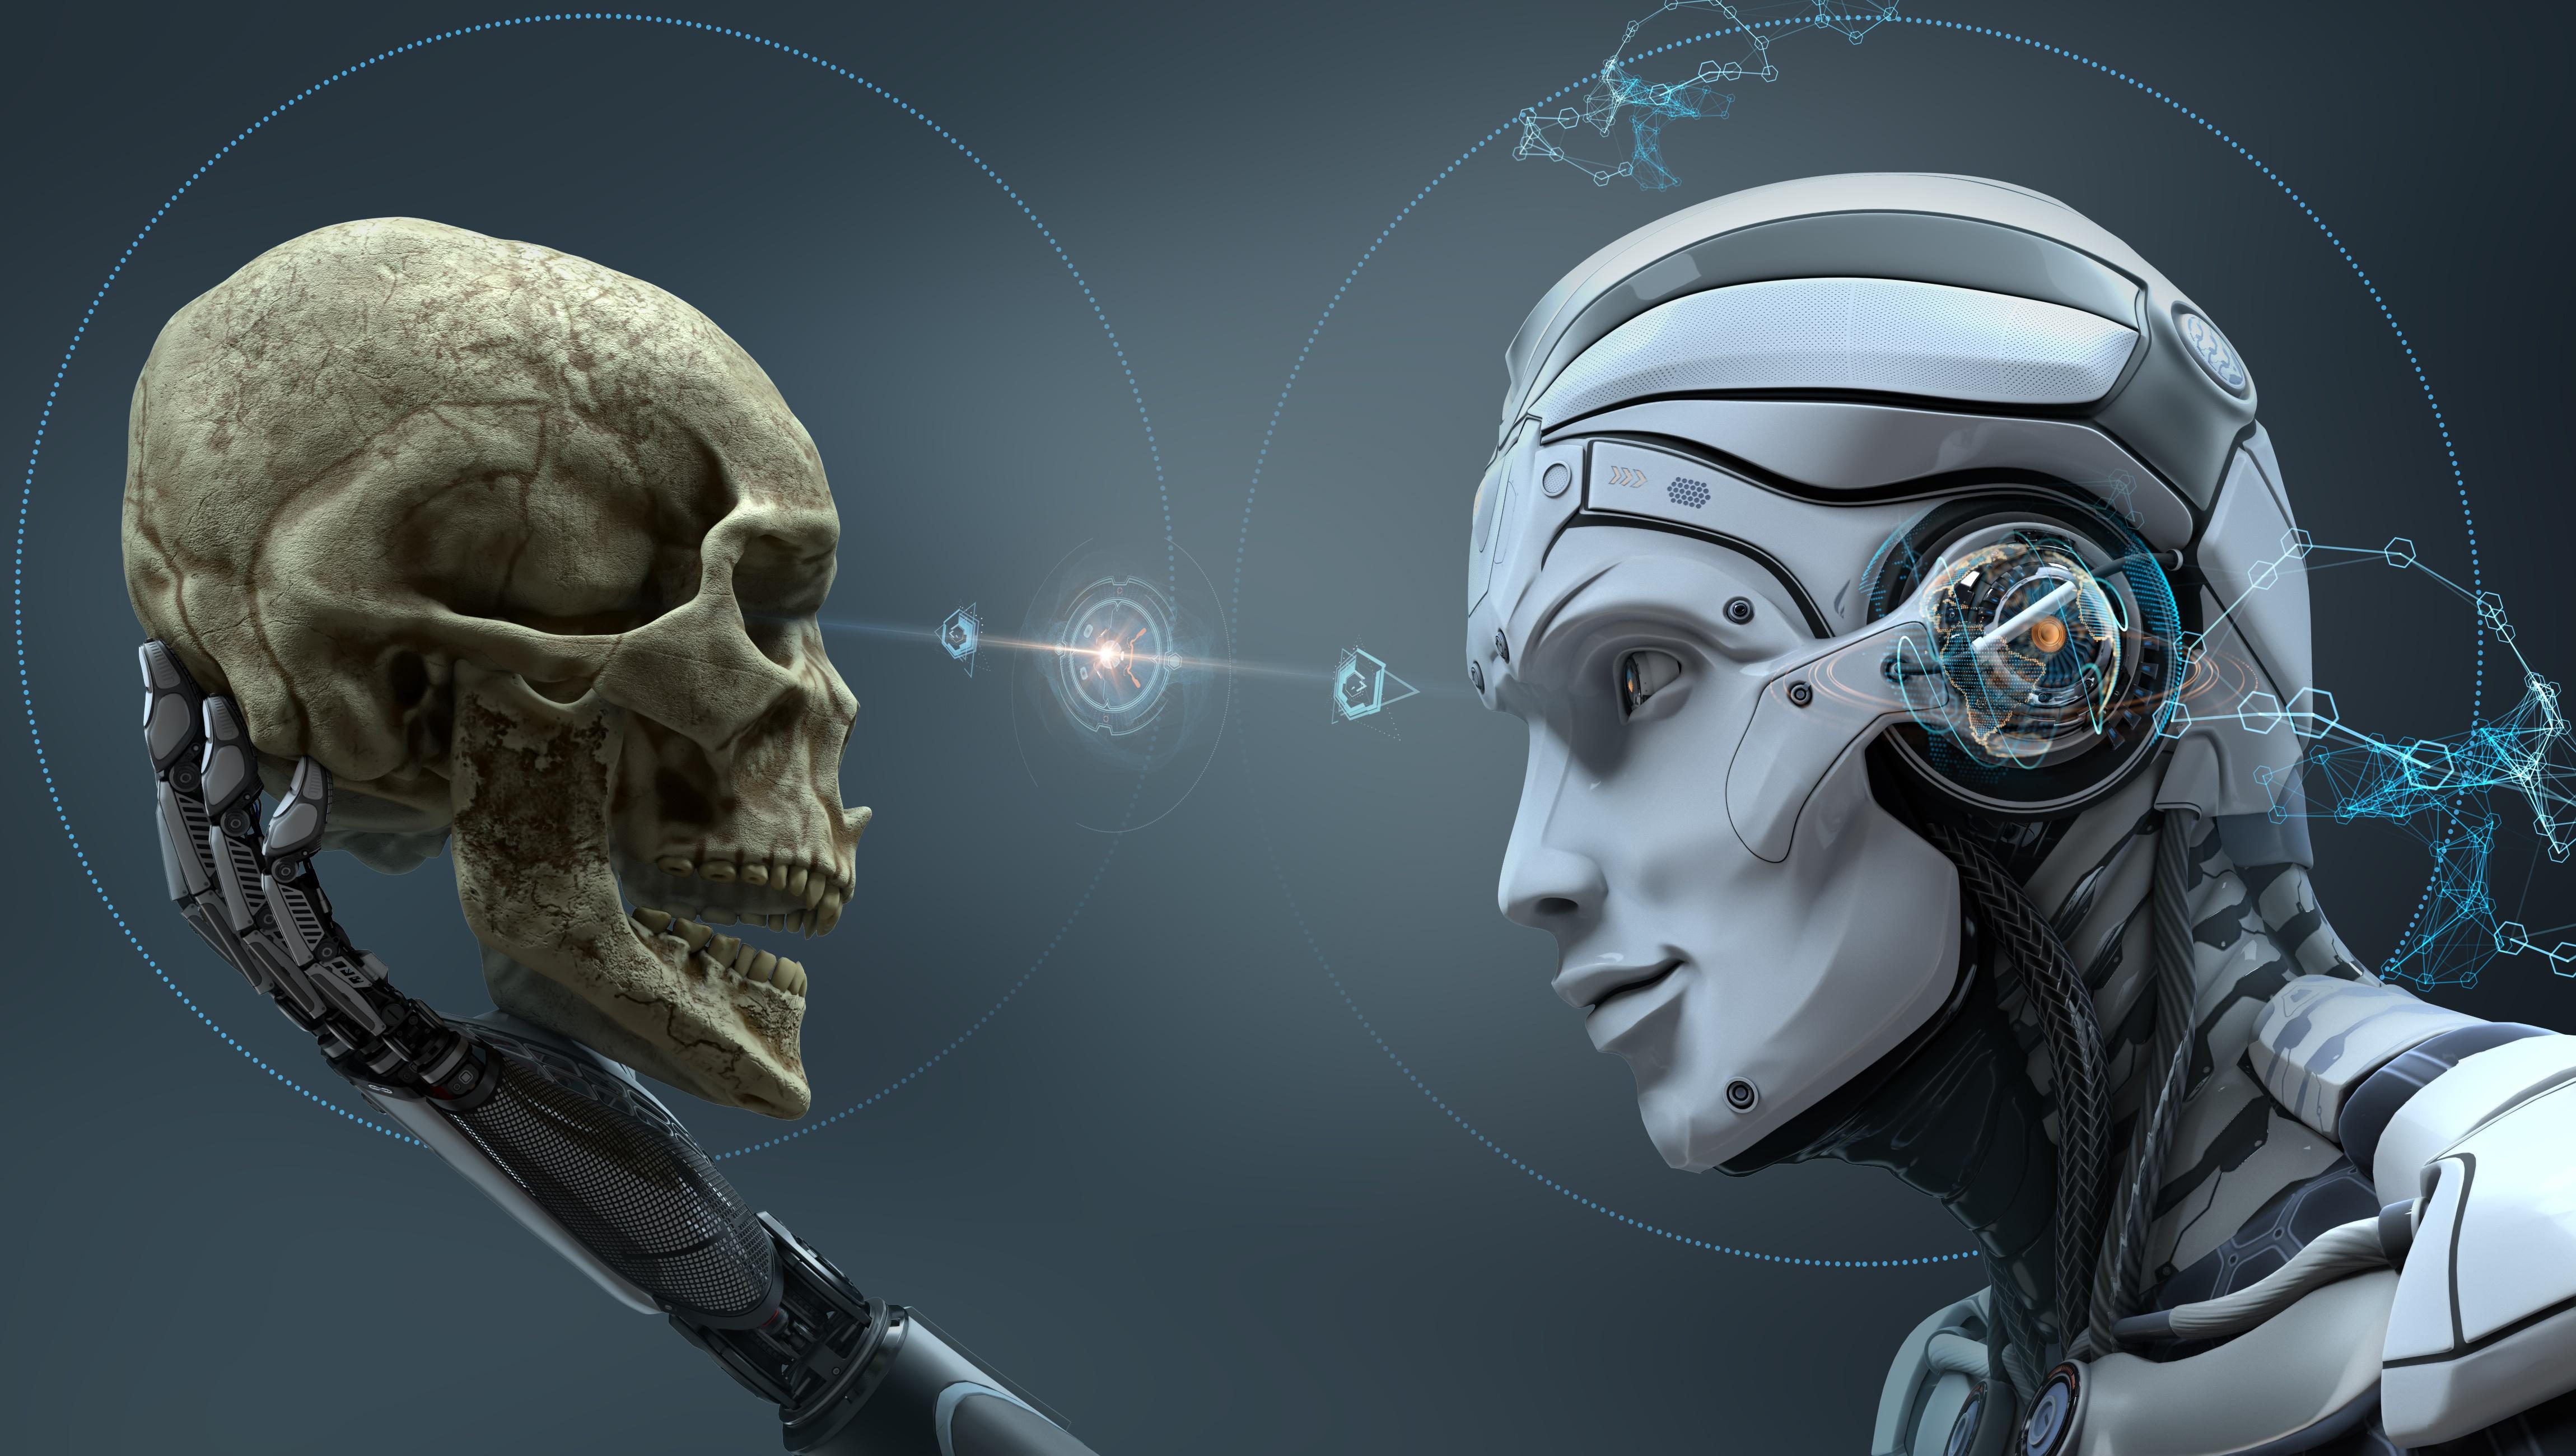 Skull machine robot hd others 4k wallpapers images - Skull 4k images ...